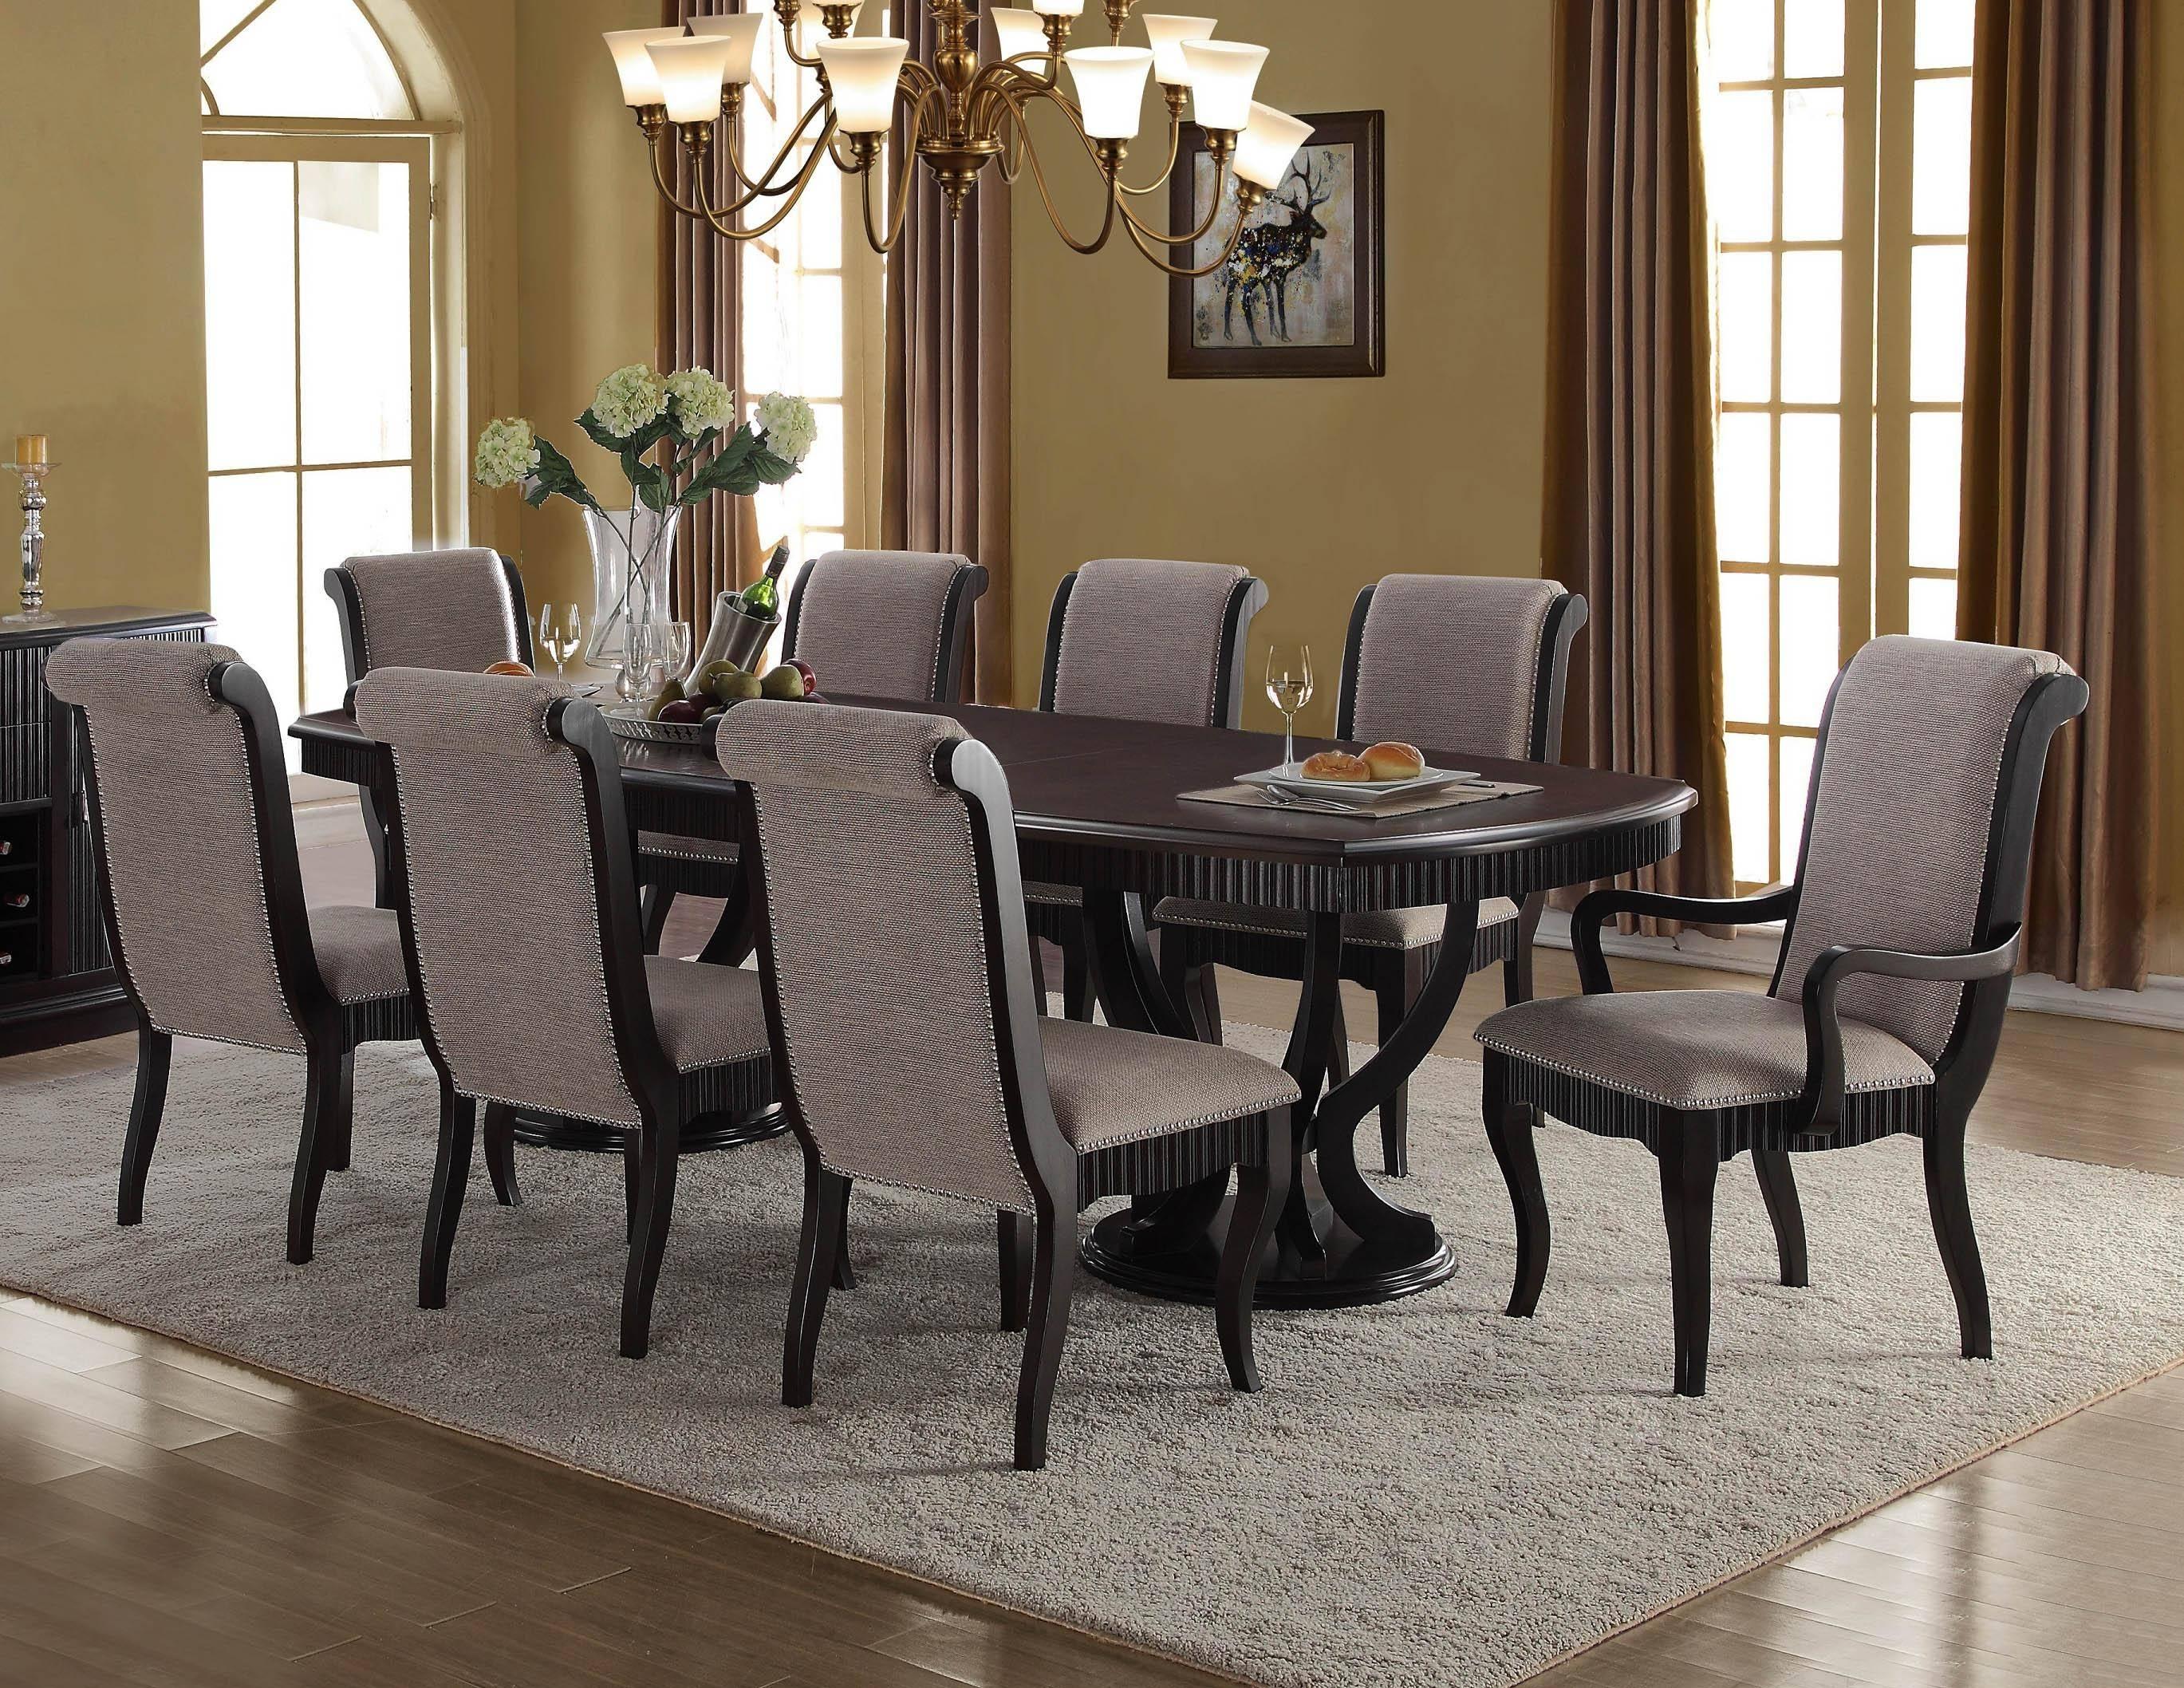 Buy Mcferran D1600 Dining Table Set 7 Pcs In Black Gray Fabric Online